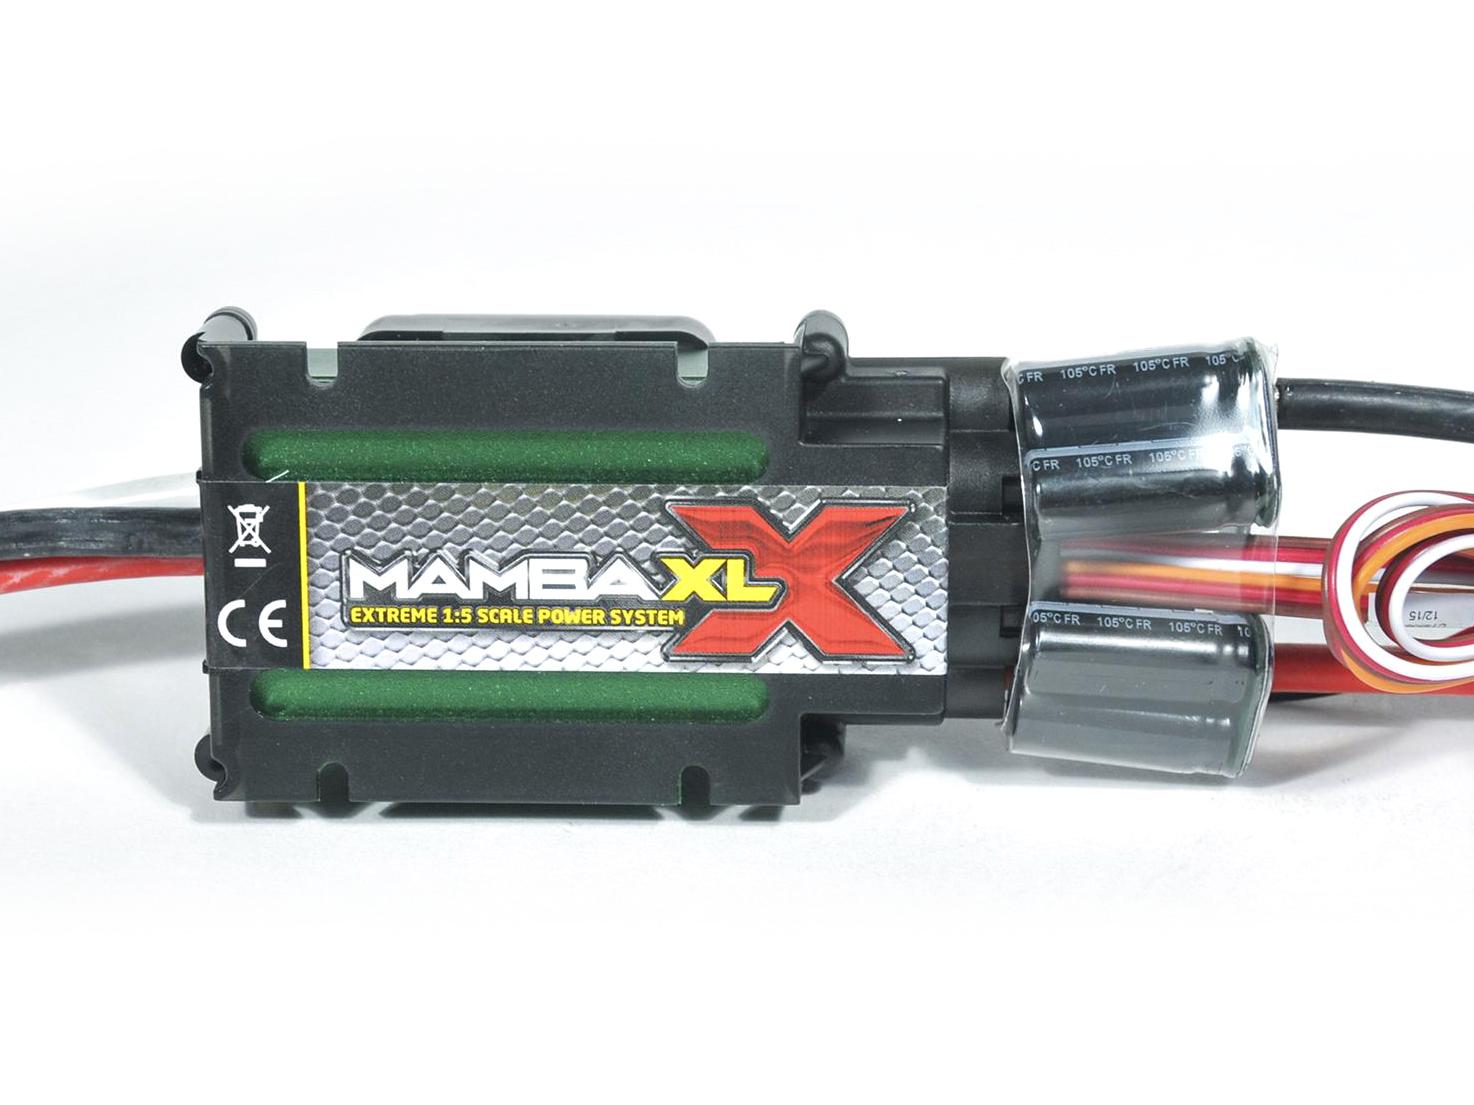 Castle Creations Mamba XLX 34V ESC, 20Amp Peak Bec